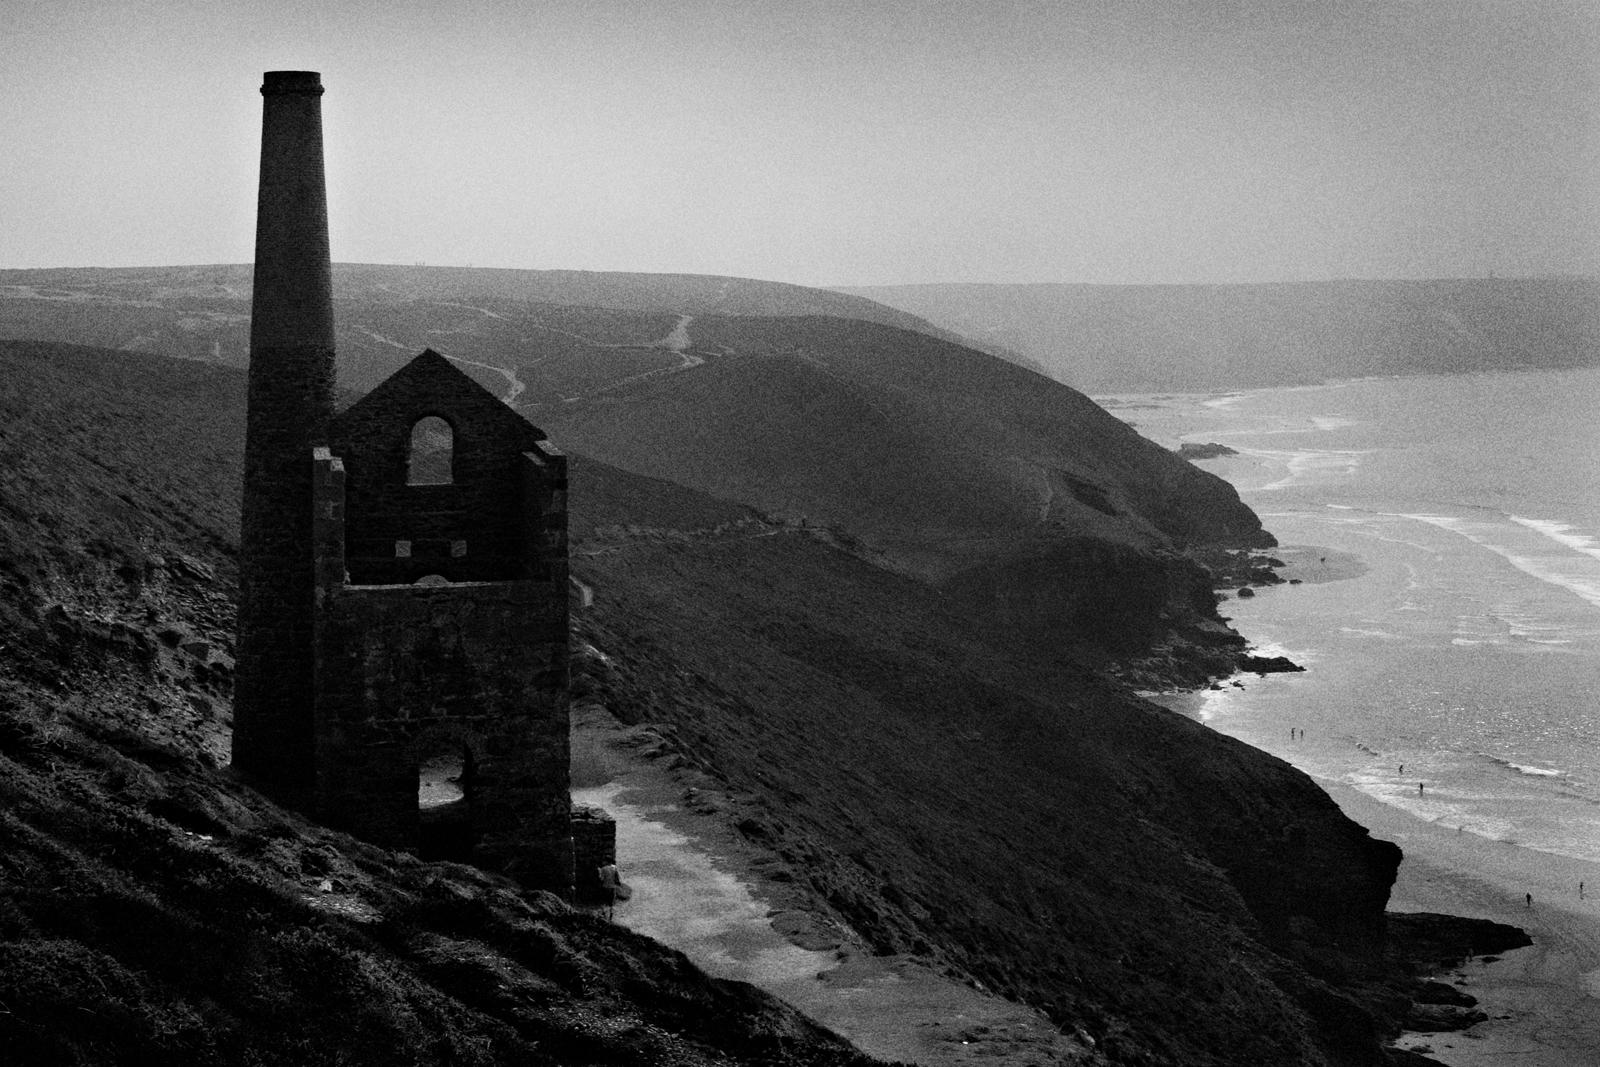 Endurance (Cornwall)